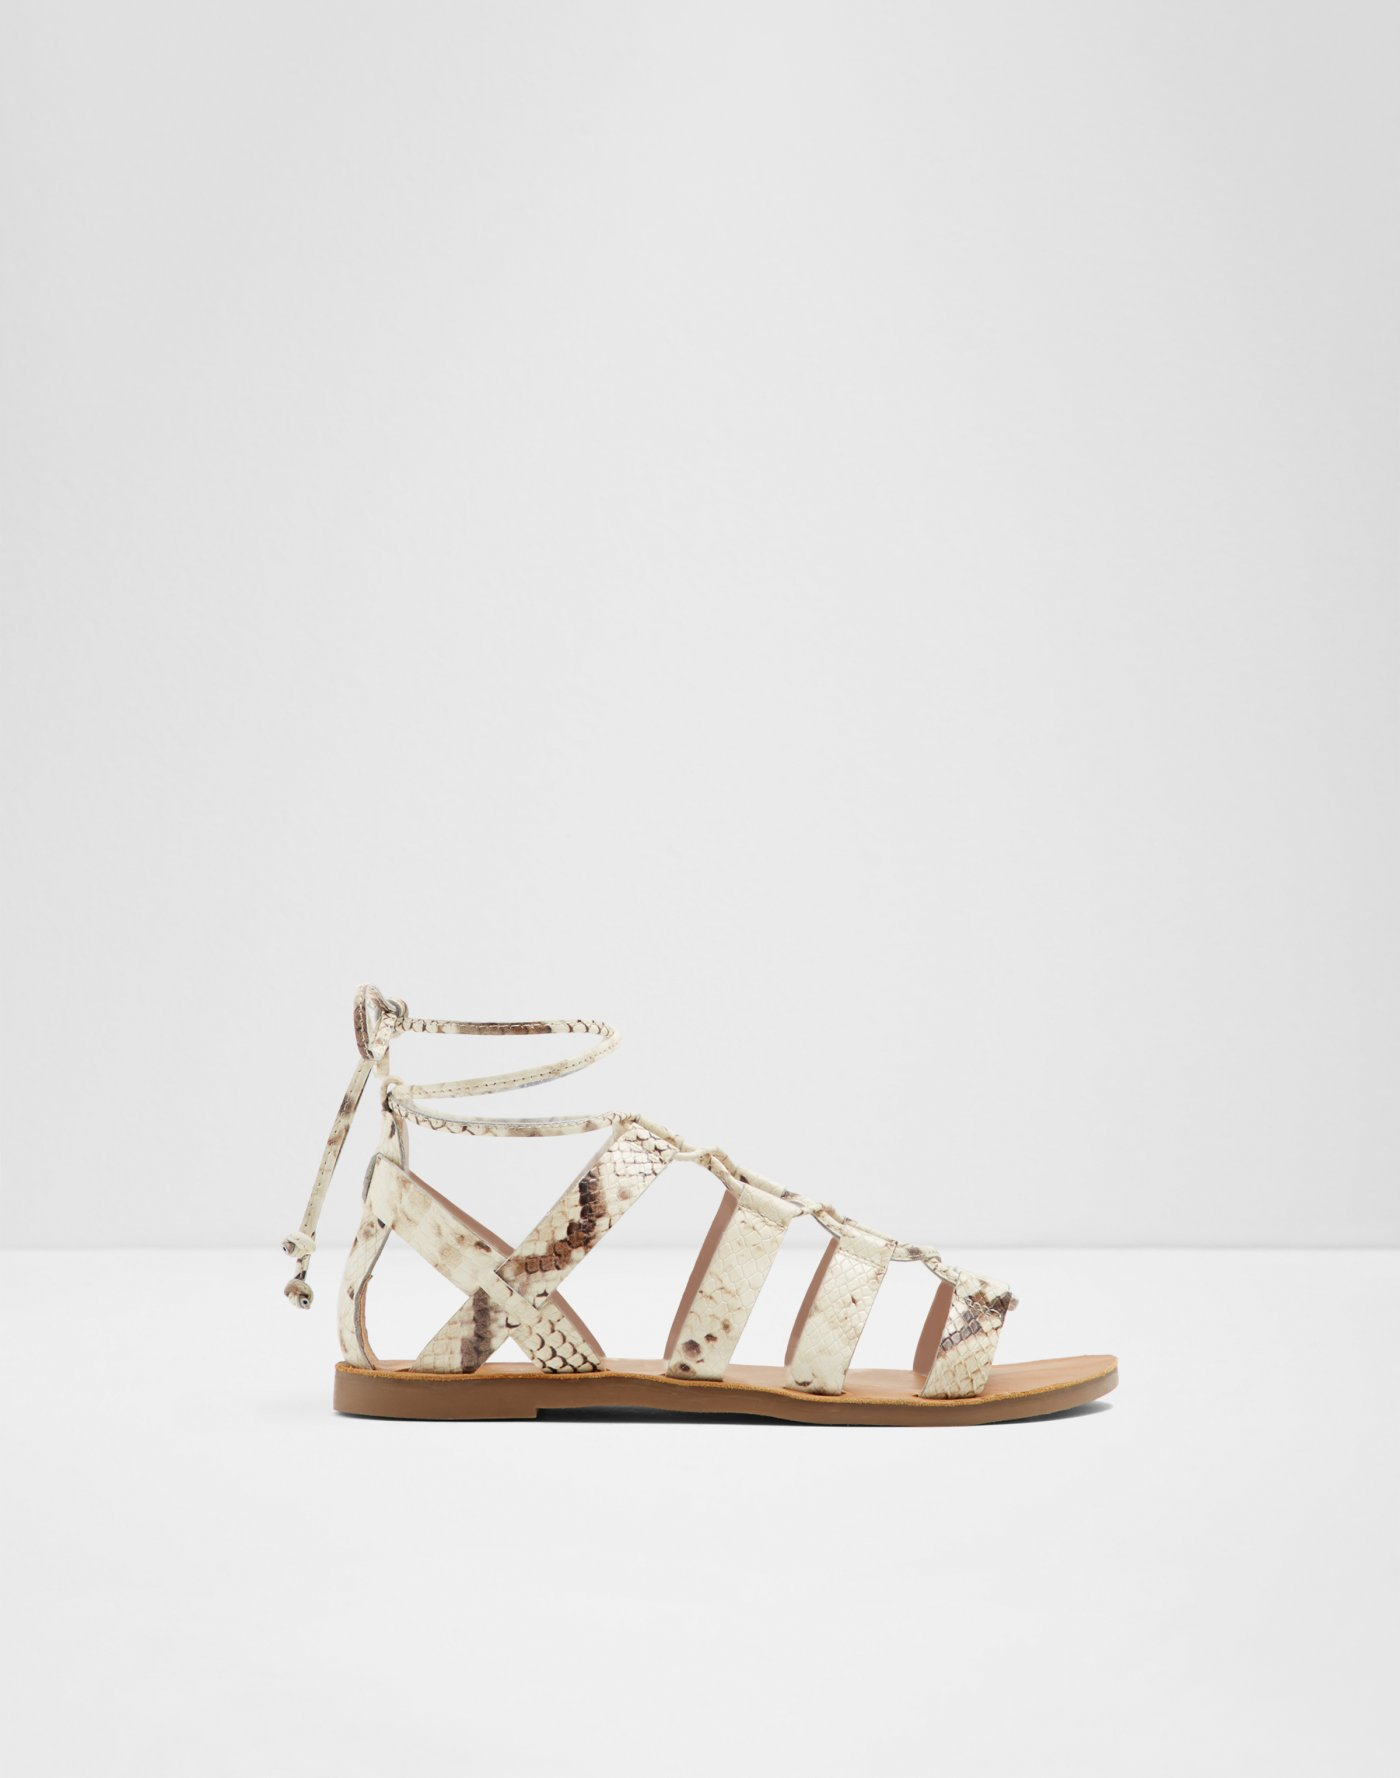 aabd1ffe29 Sandals | Aldoshoes.com US